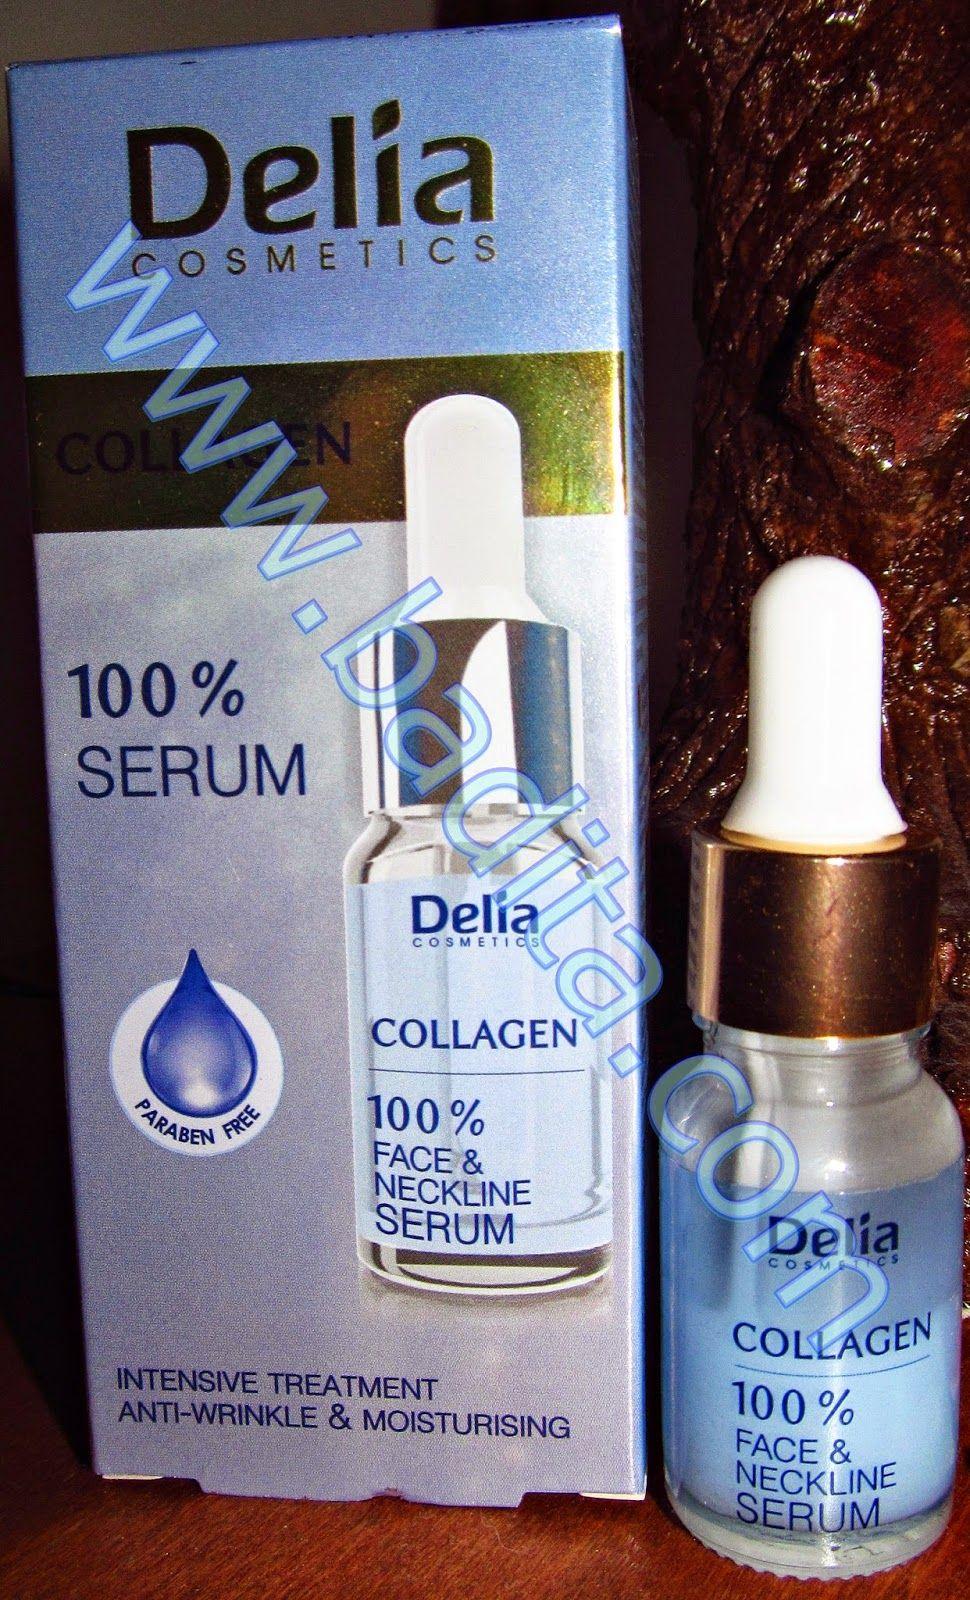 Delia Cosmetics Este O Firma Foarte Cunoscuta Din Polonia Si A Fost Infiintata In Anul